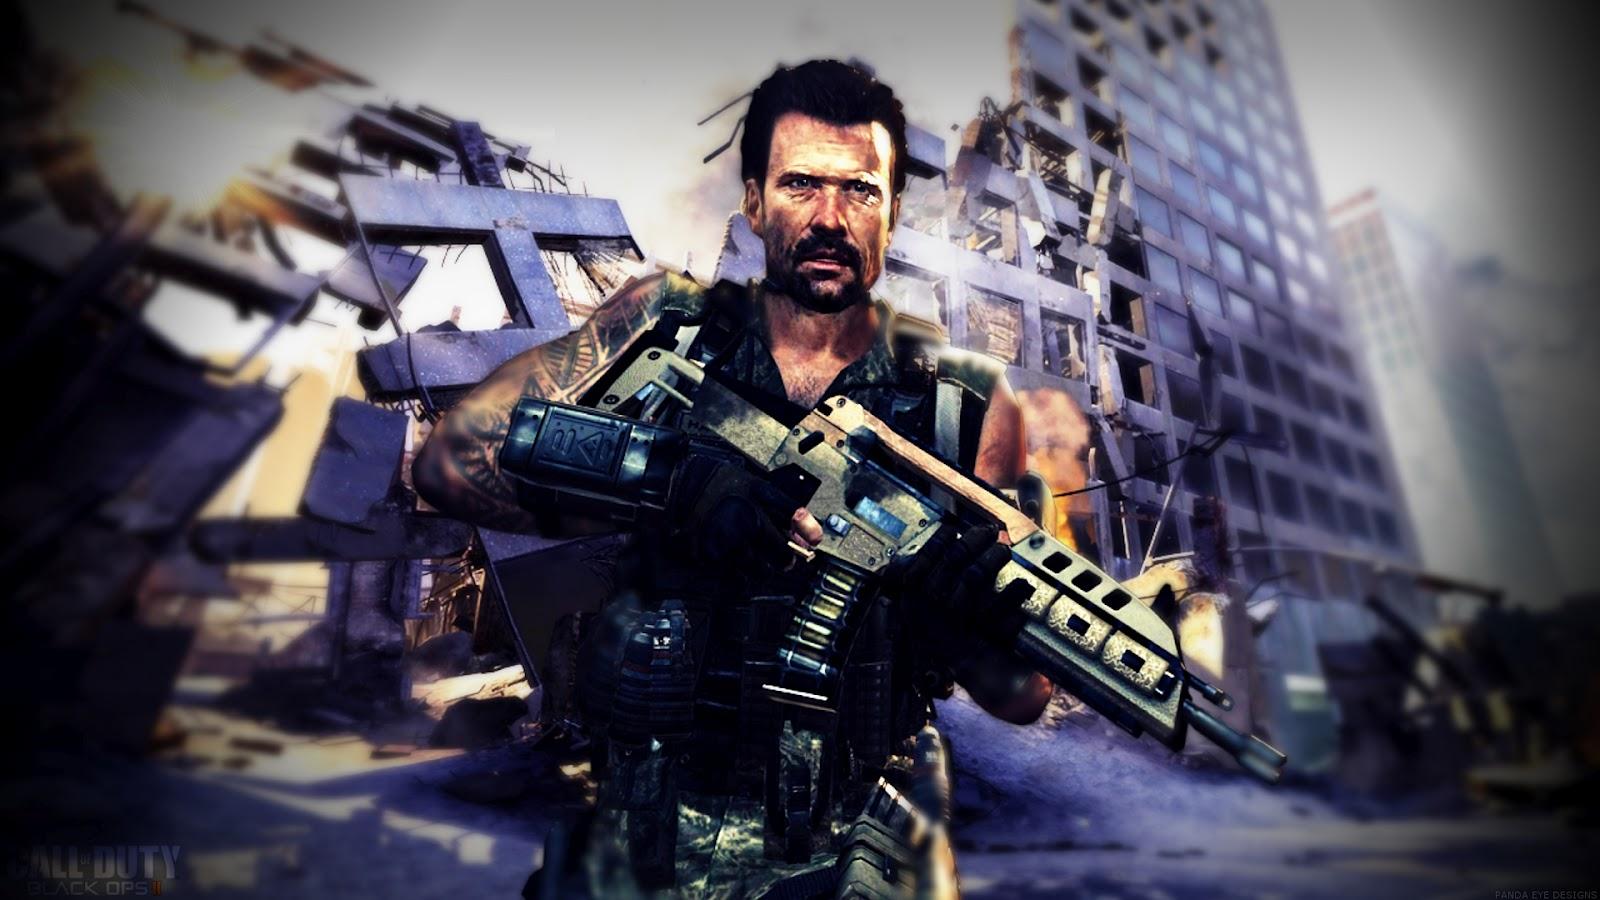 Call Of Duty Black Ops 2 HD Wallpaper 1080p PiCsHoliC 1600x900